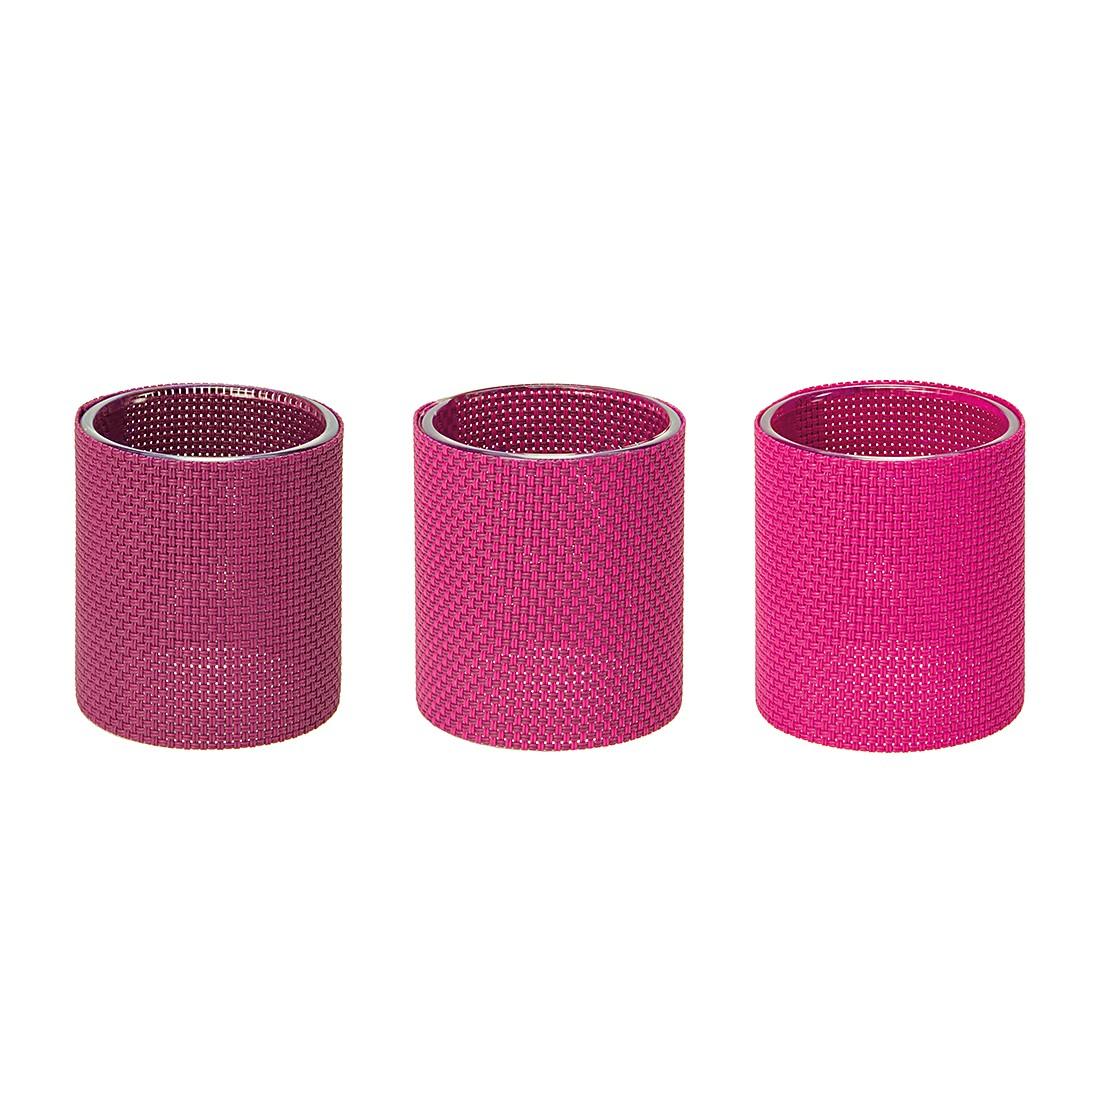 Teelichthalter Marah (3er-Set) Klarglas/Kunststoff Pink, Contento jetzt kaufen